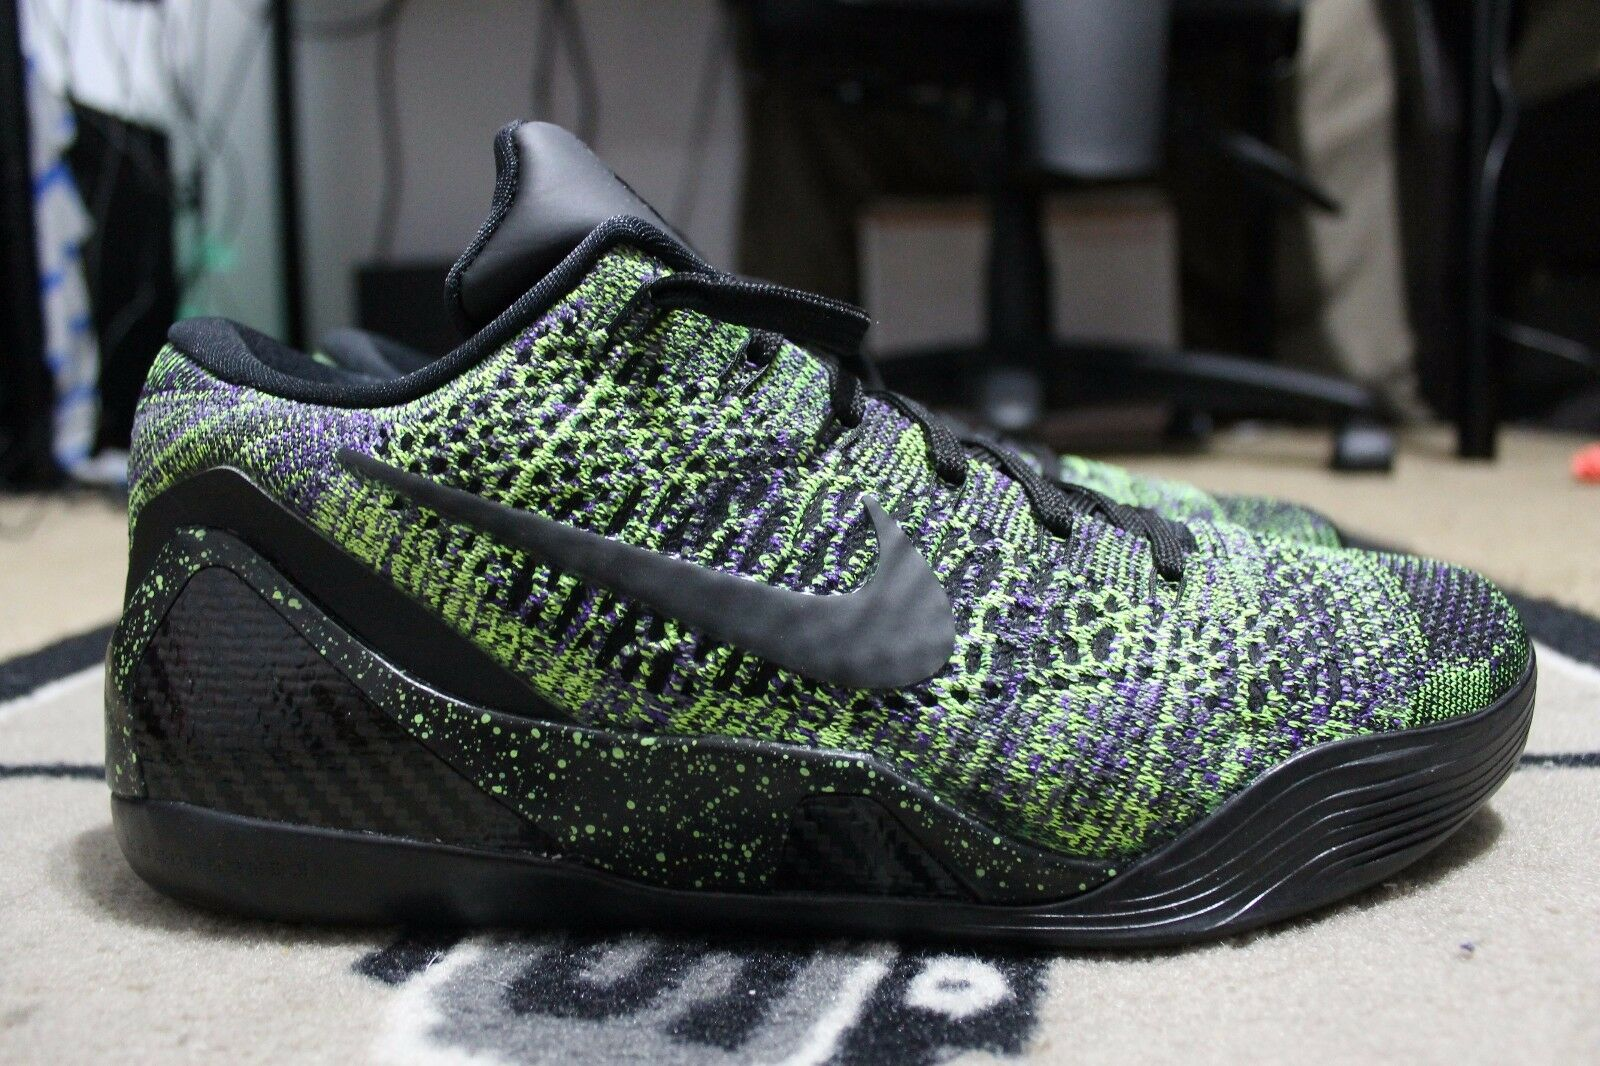 NEW Nike iD Kobe 9 SZ Elite Flyknit Mamba Moment SZ 9 10.5 Multicolor BLACK 361656